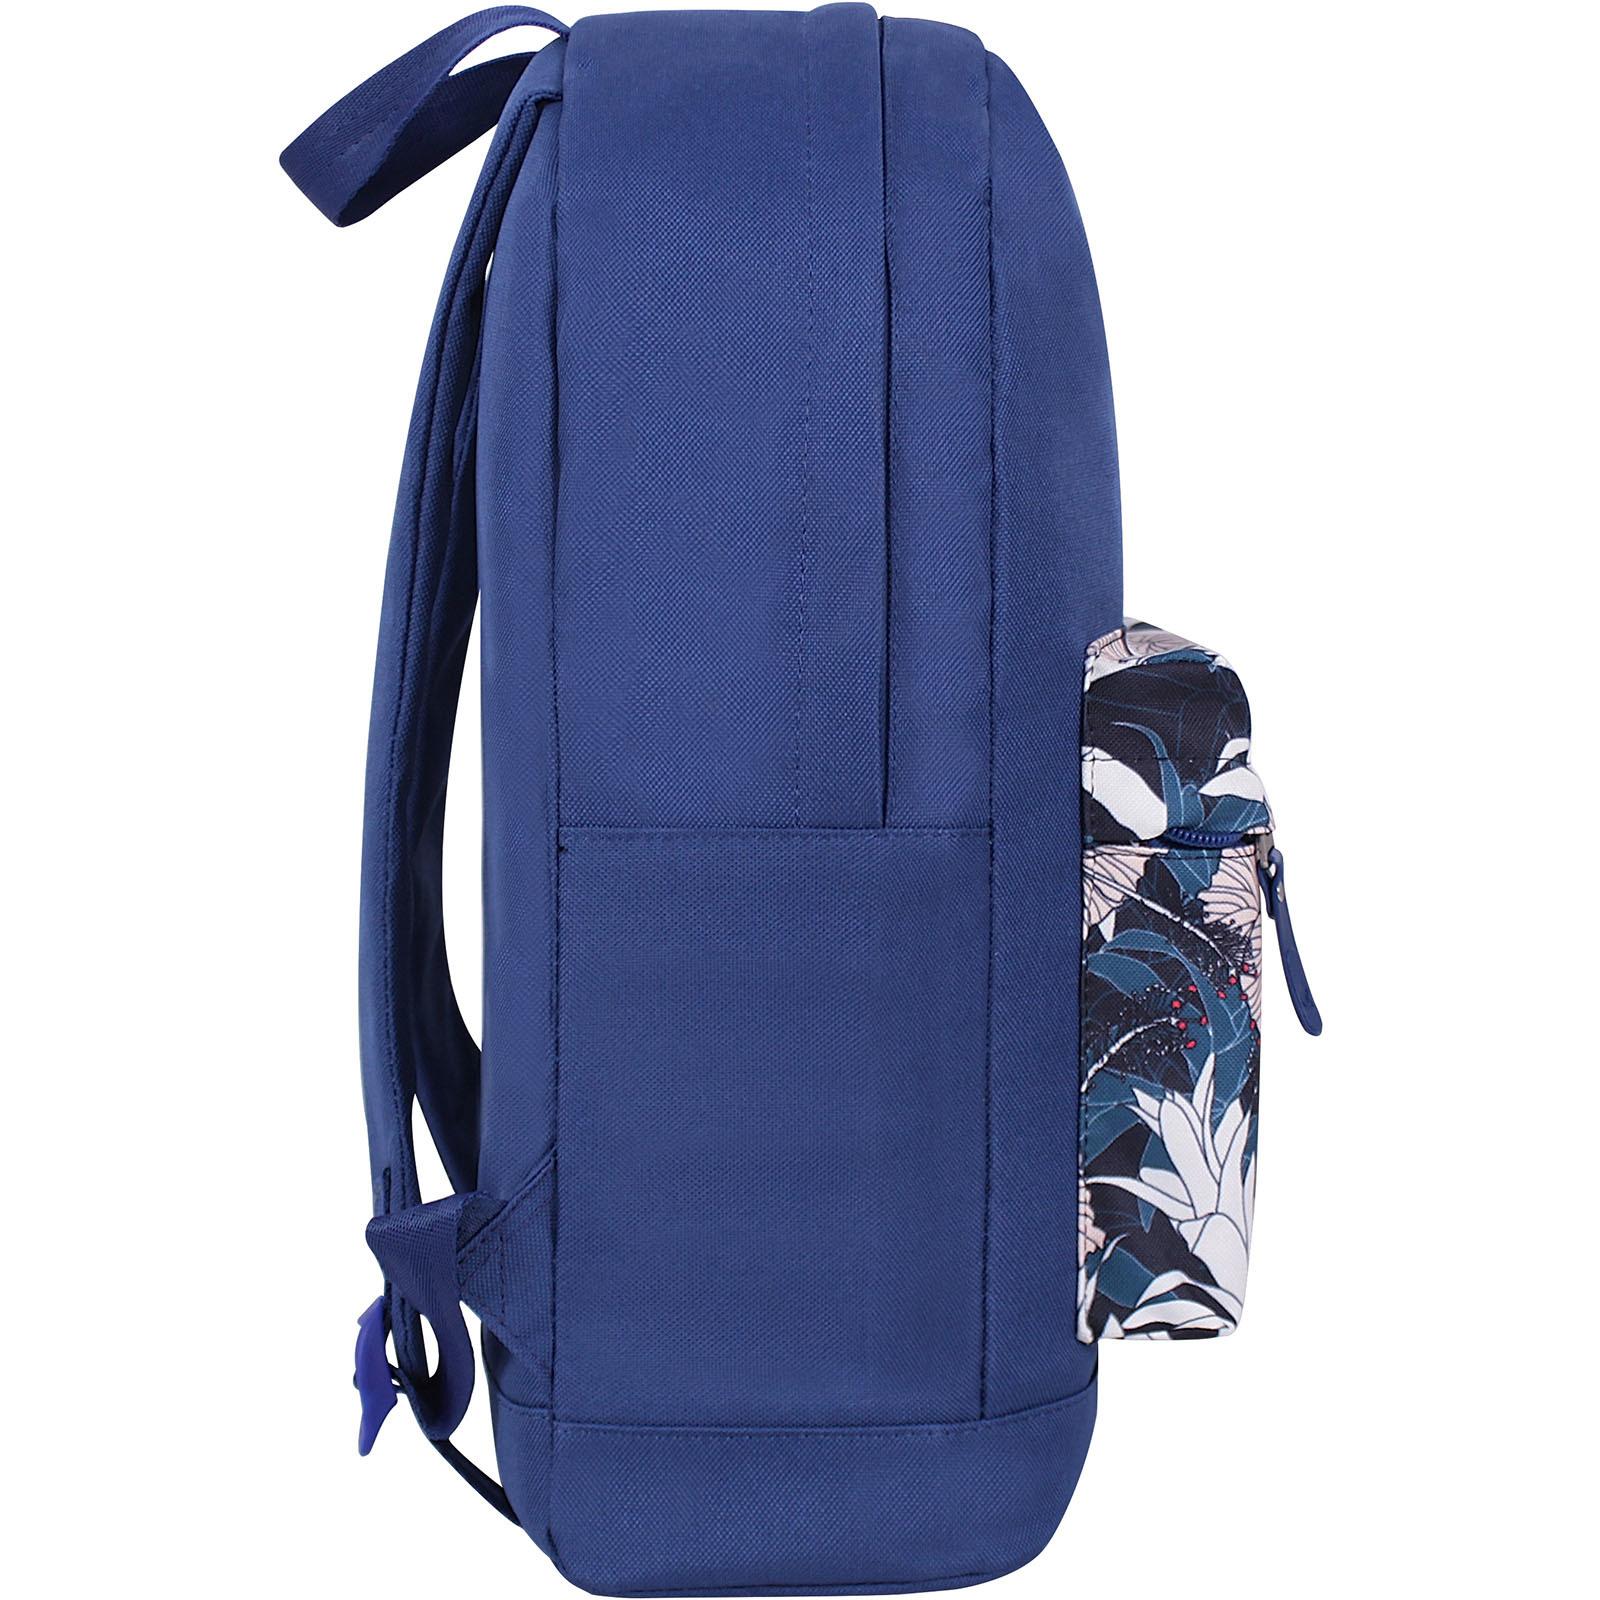 Рюкзак Bagland Молодежный W/R 17 л. Синий 766 (00533662) фото 2